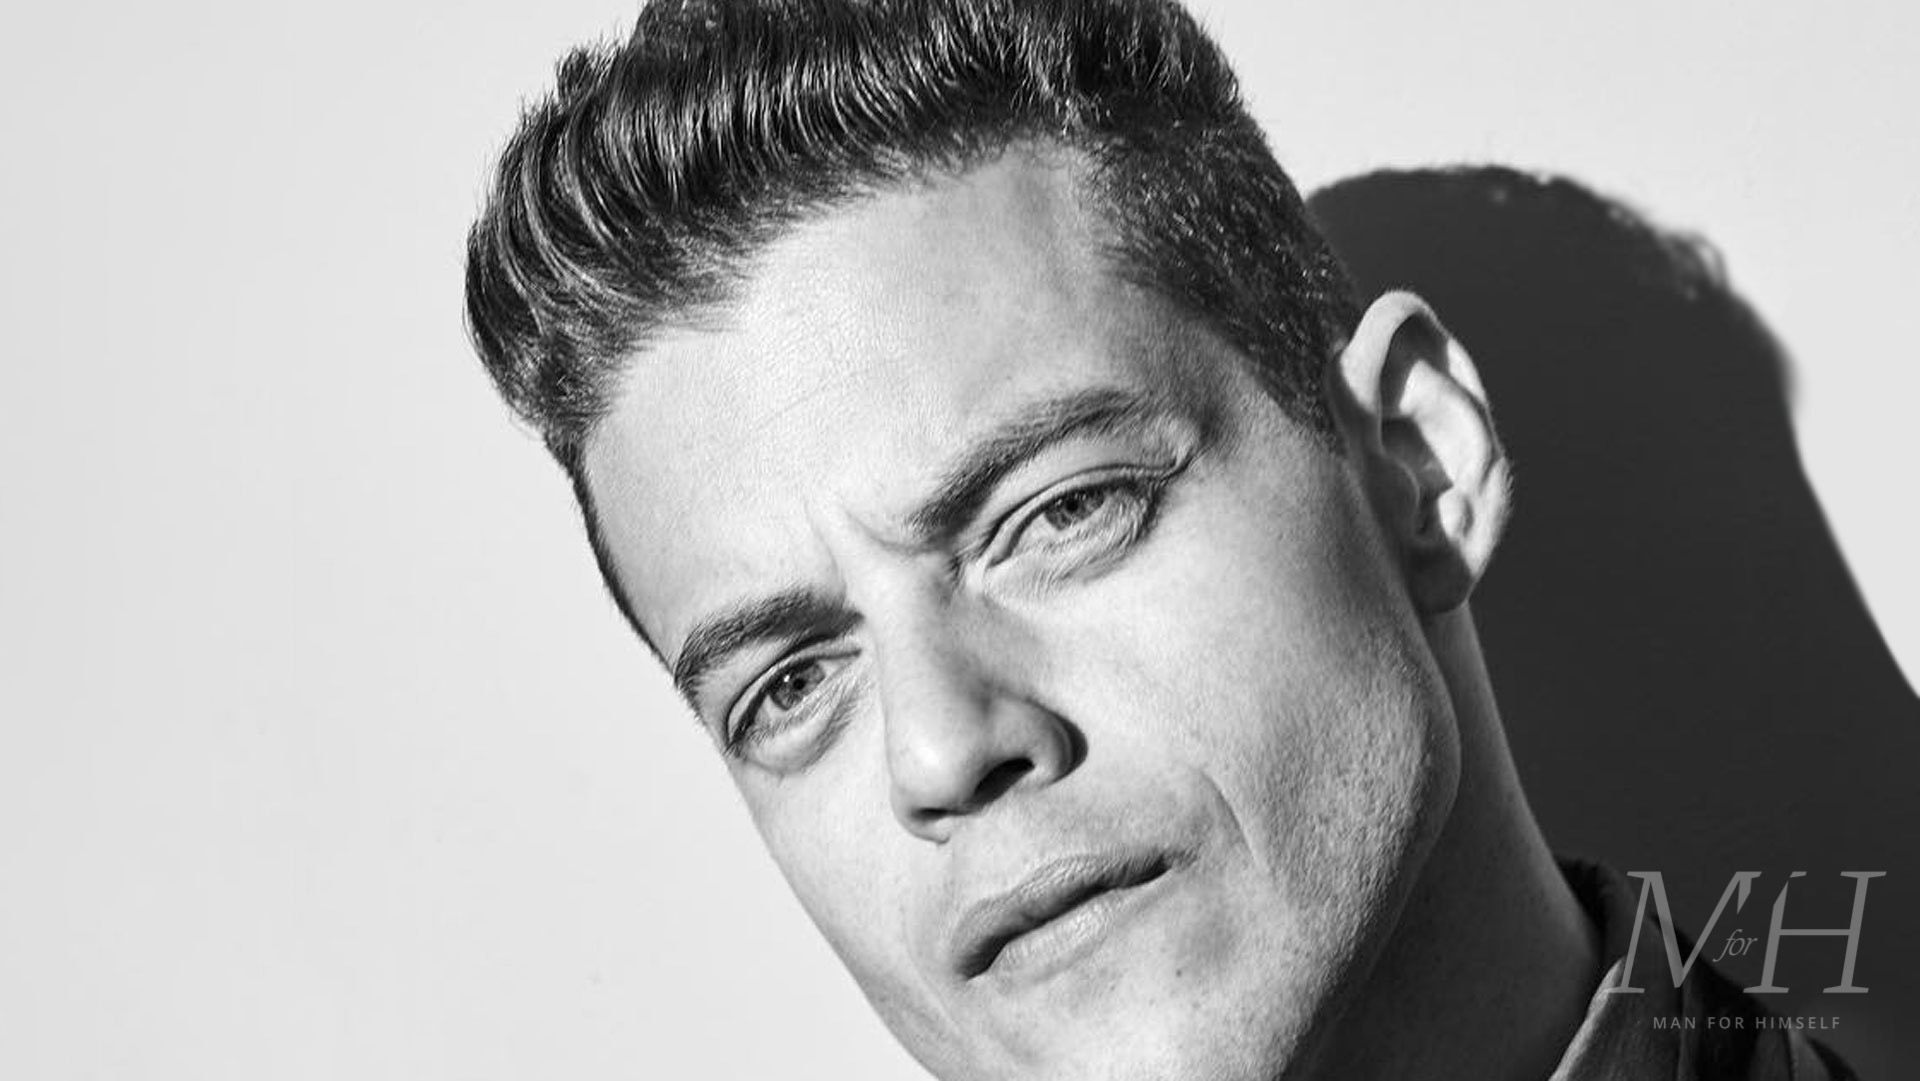 Rami Malek Short Textured Fringe Hairstyle Man For Himself